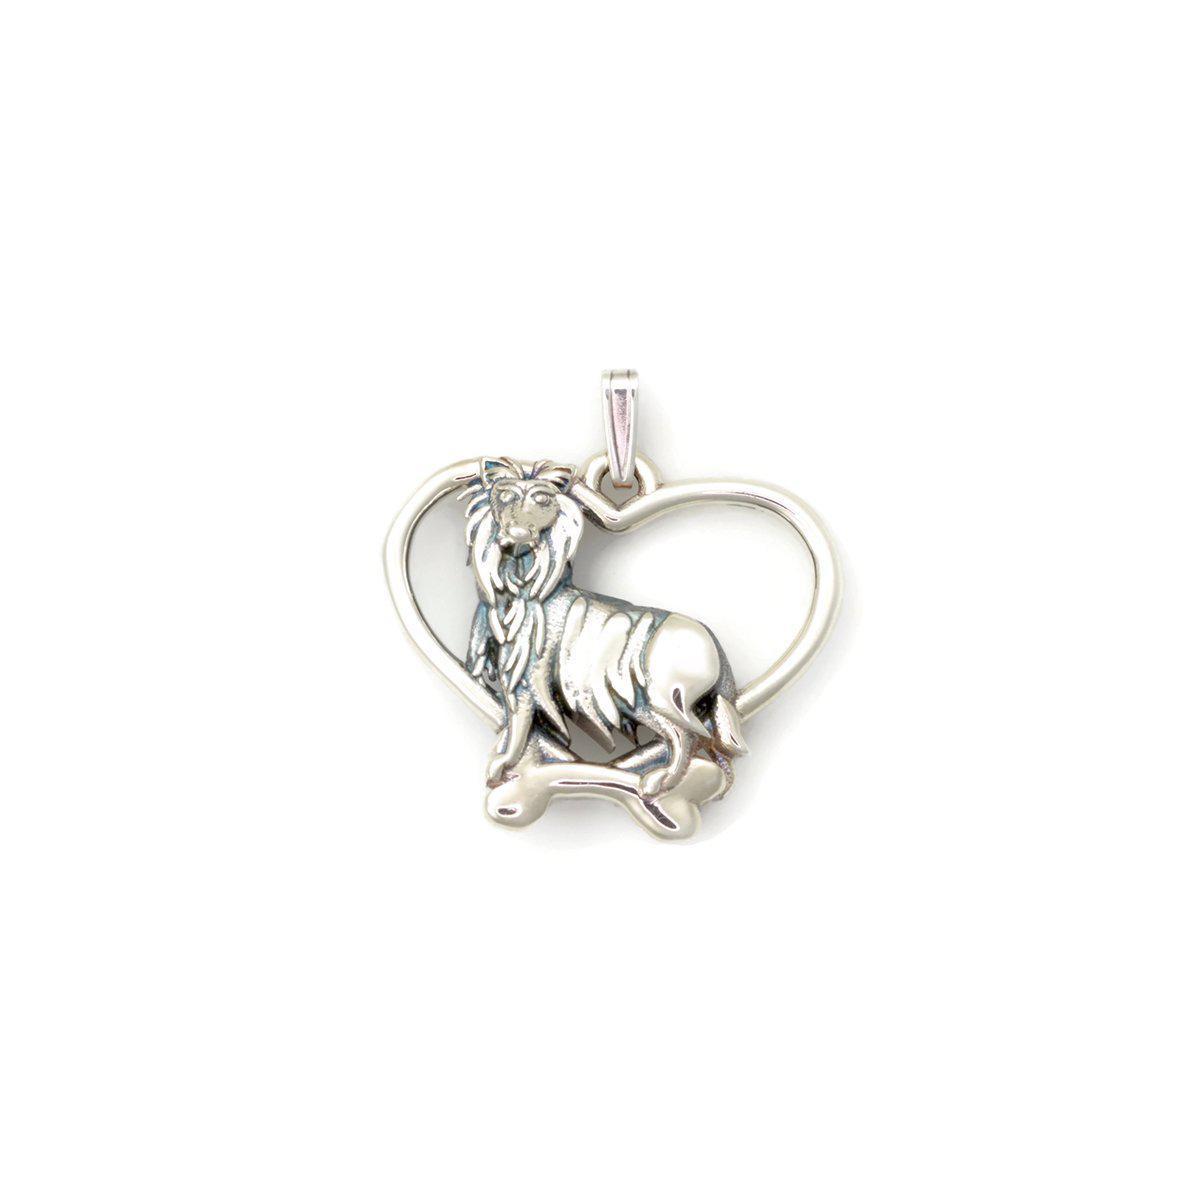 Donna Pizarro Designs Sterling Silver Sheltie Necklace sNlWo96p